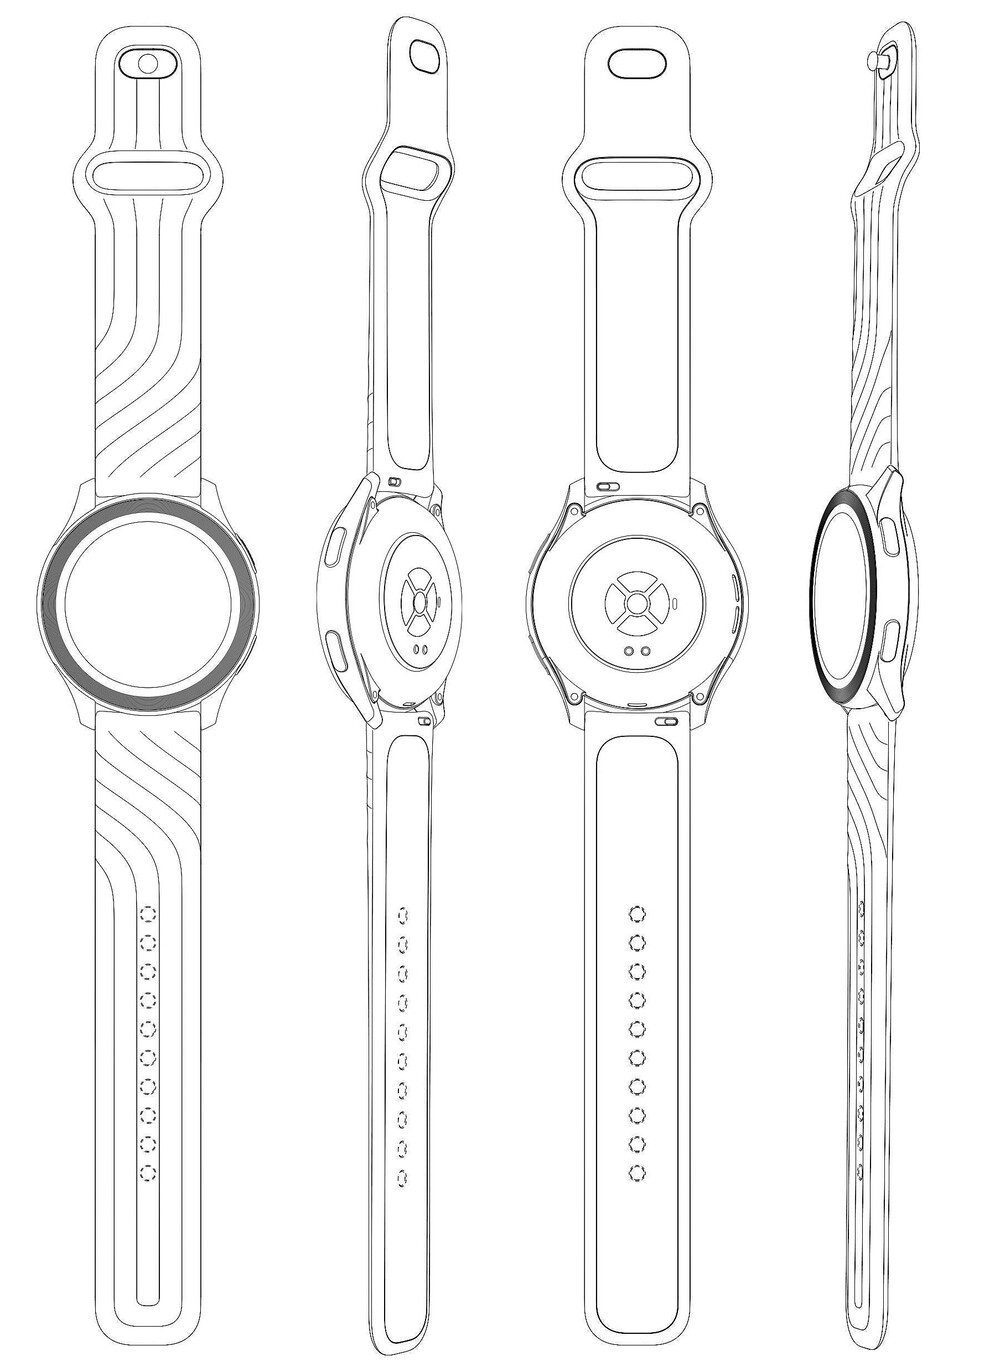 The sportier OnePlus Watch